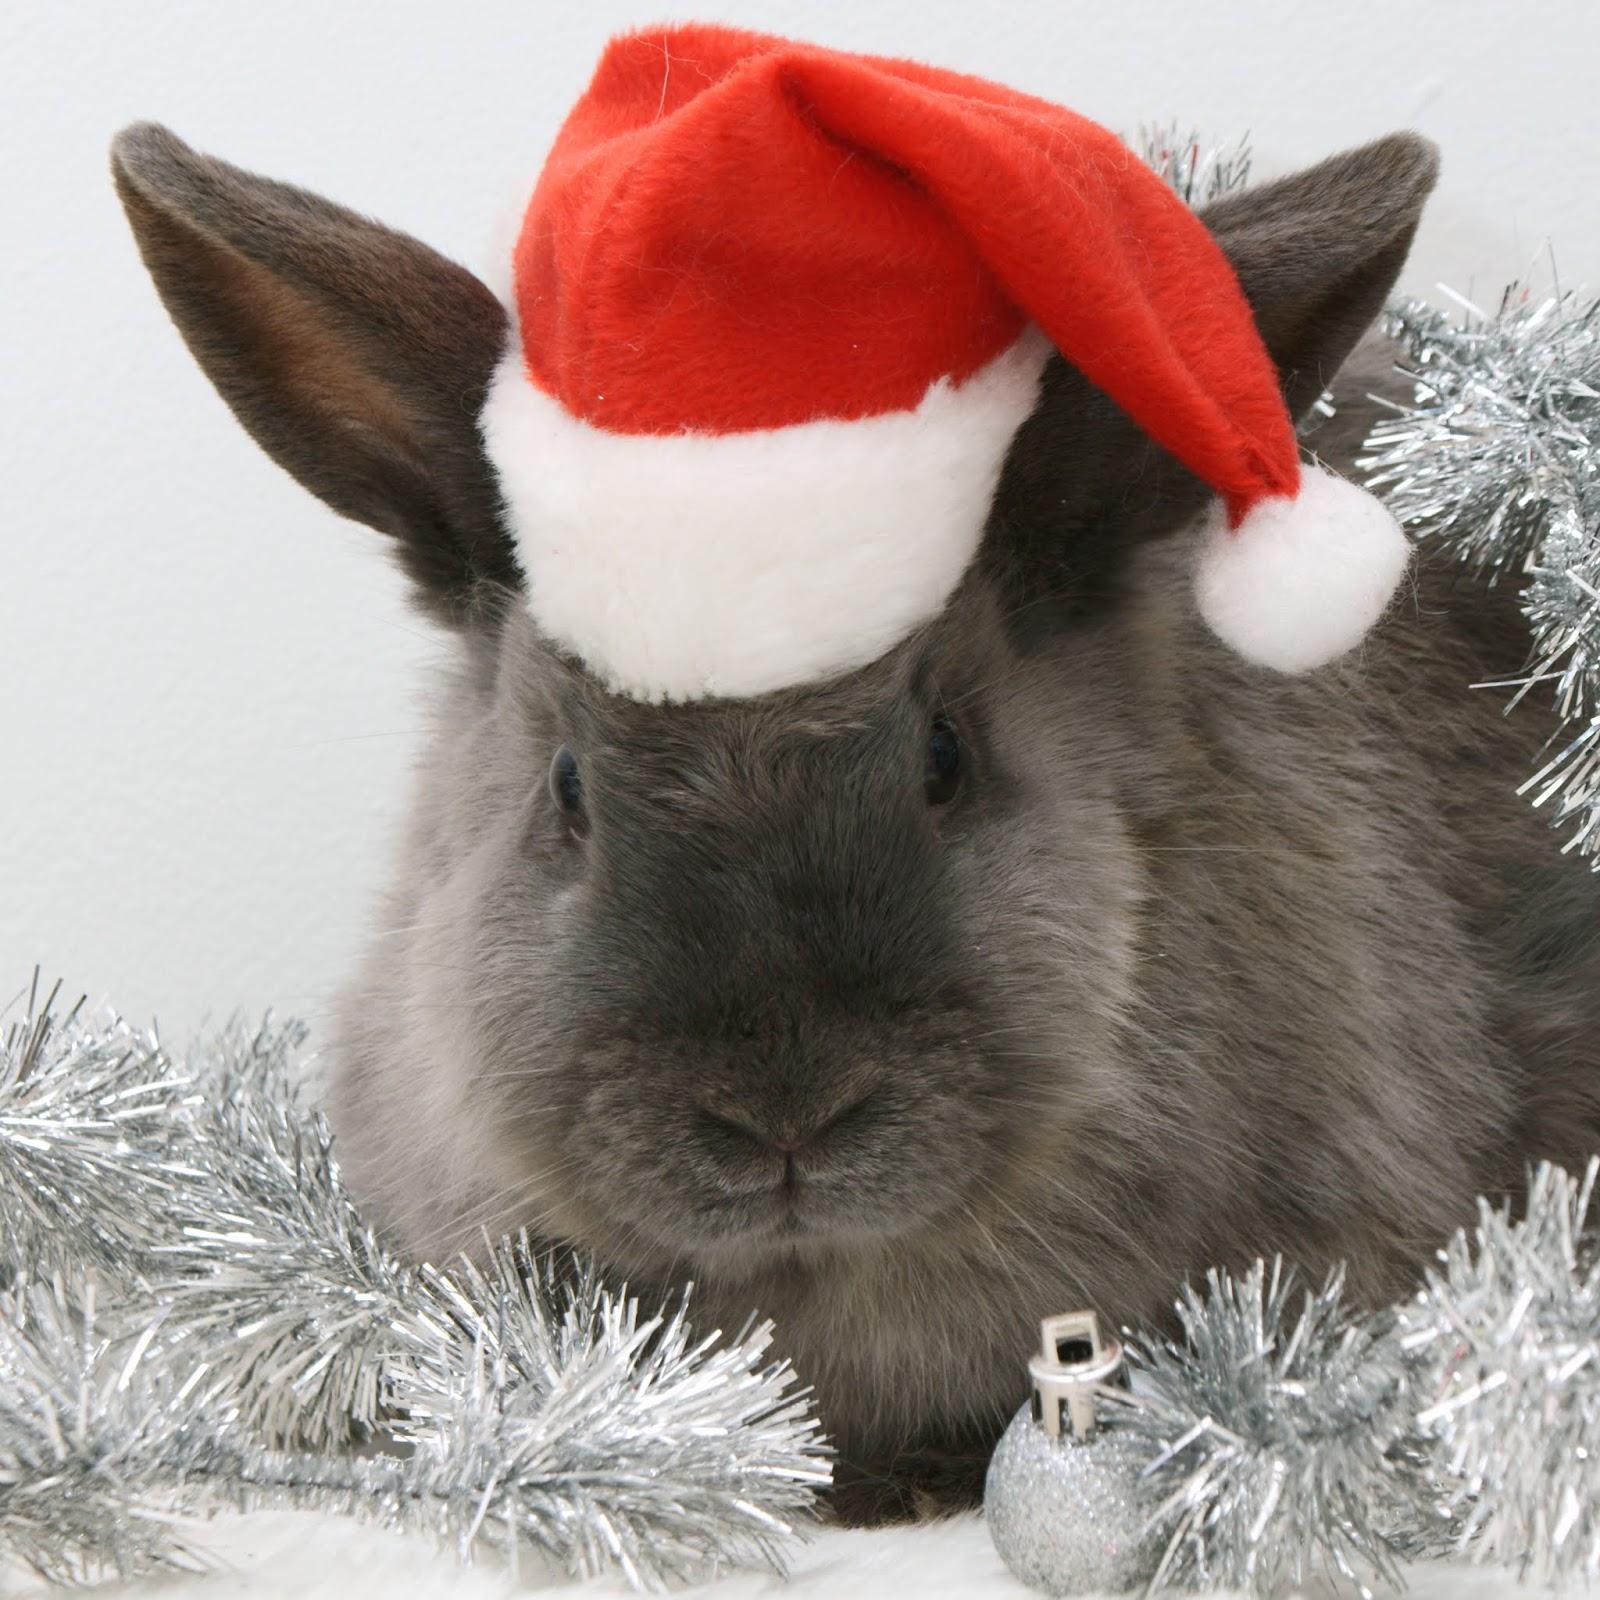 Картинки года кролика, мальчику лет